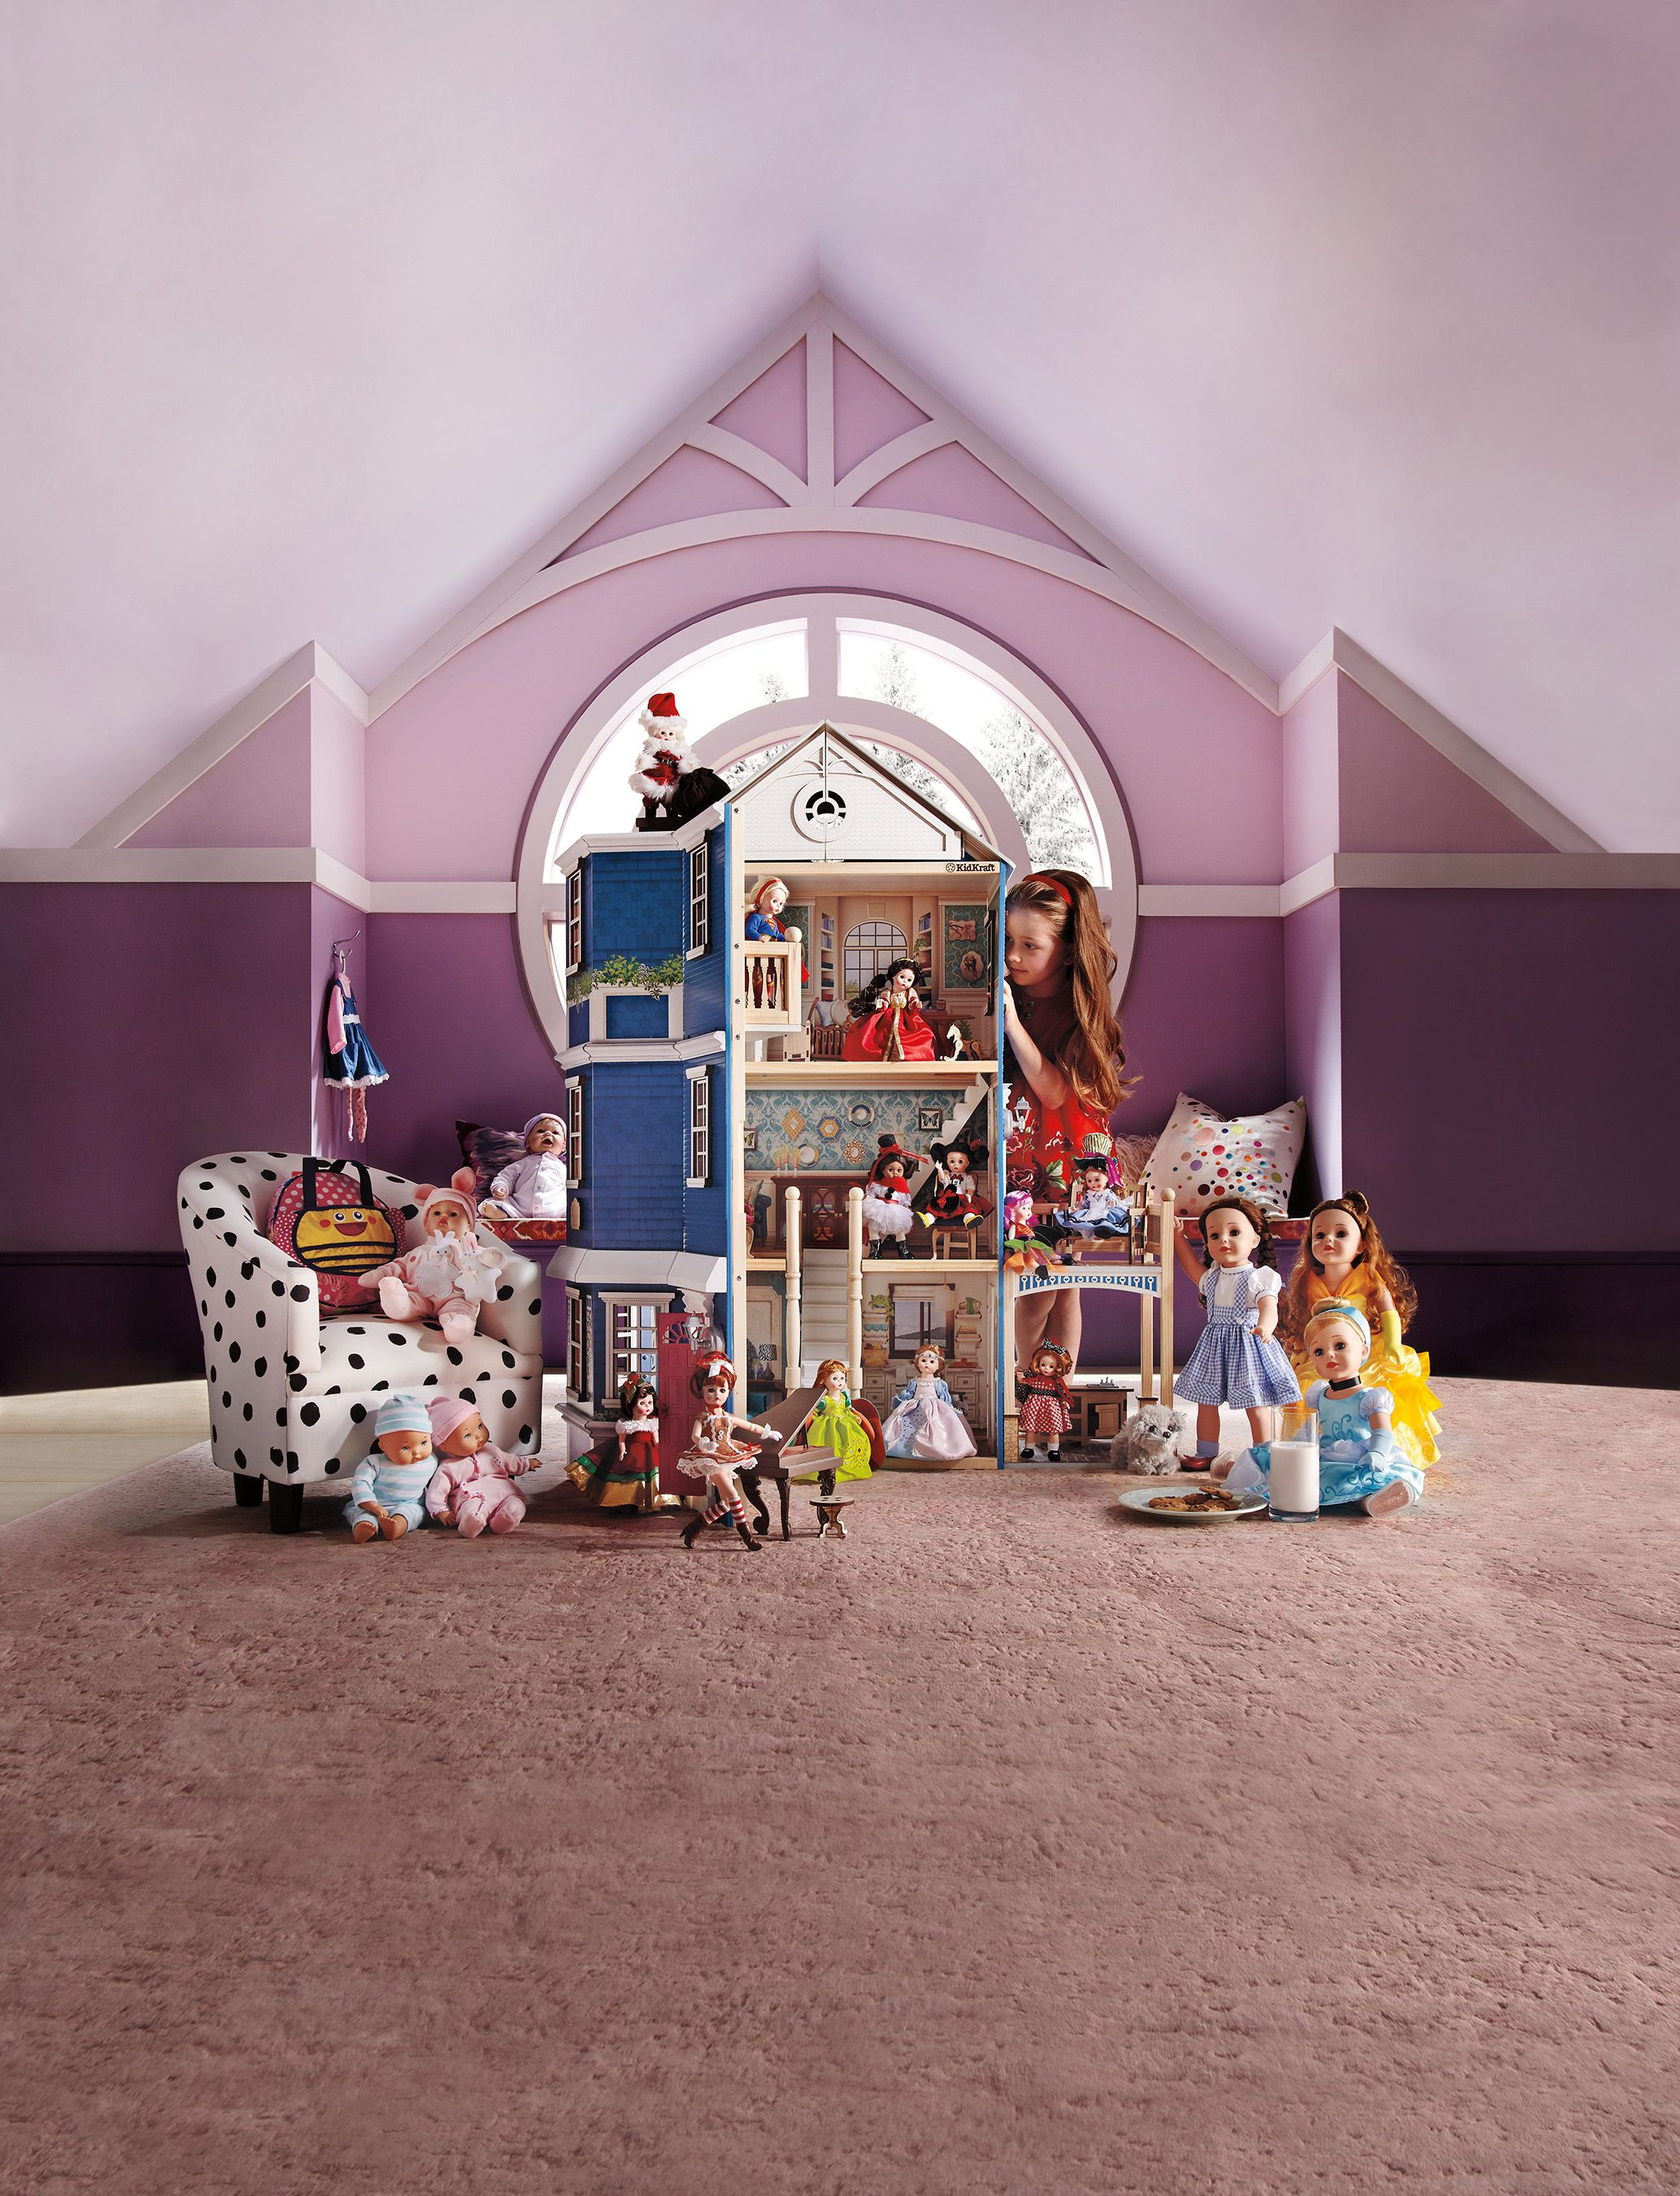 neiman marcus fantasy gift catalogue